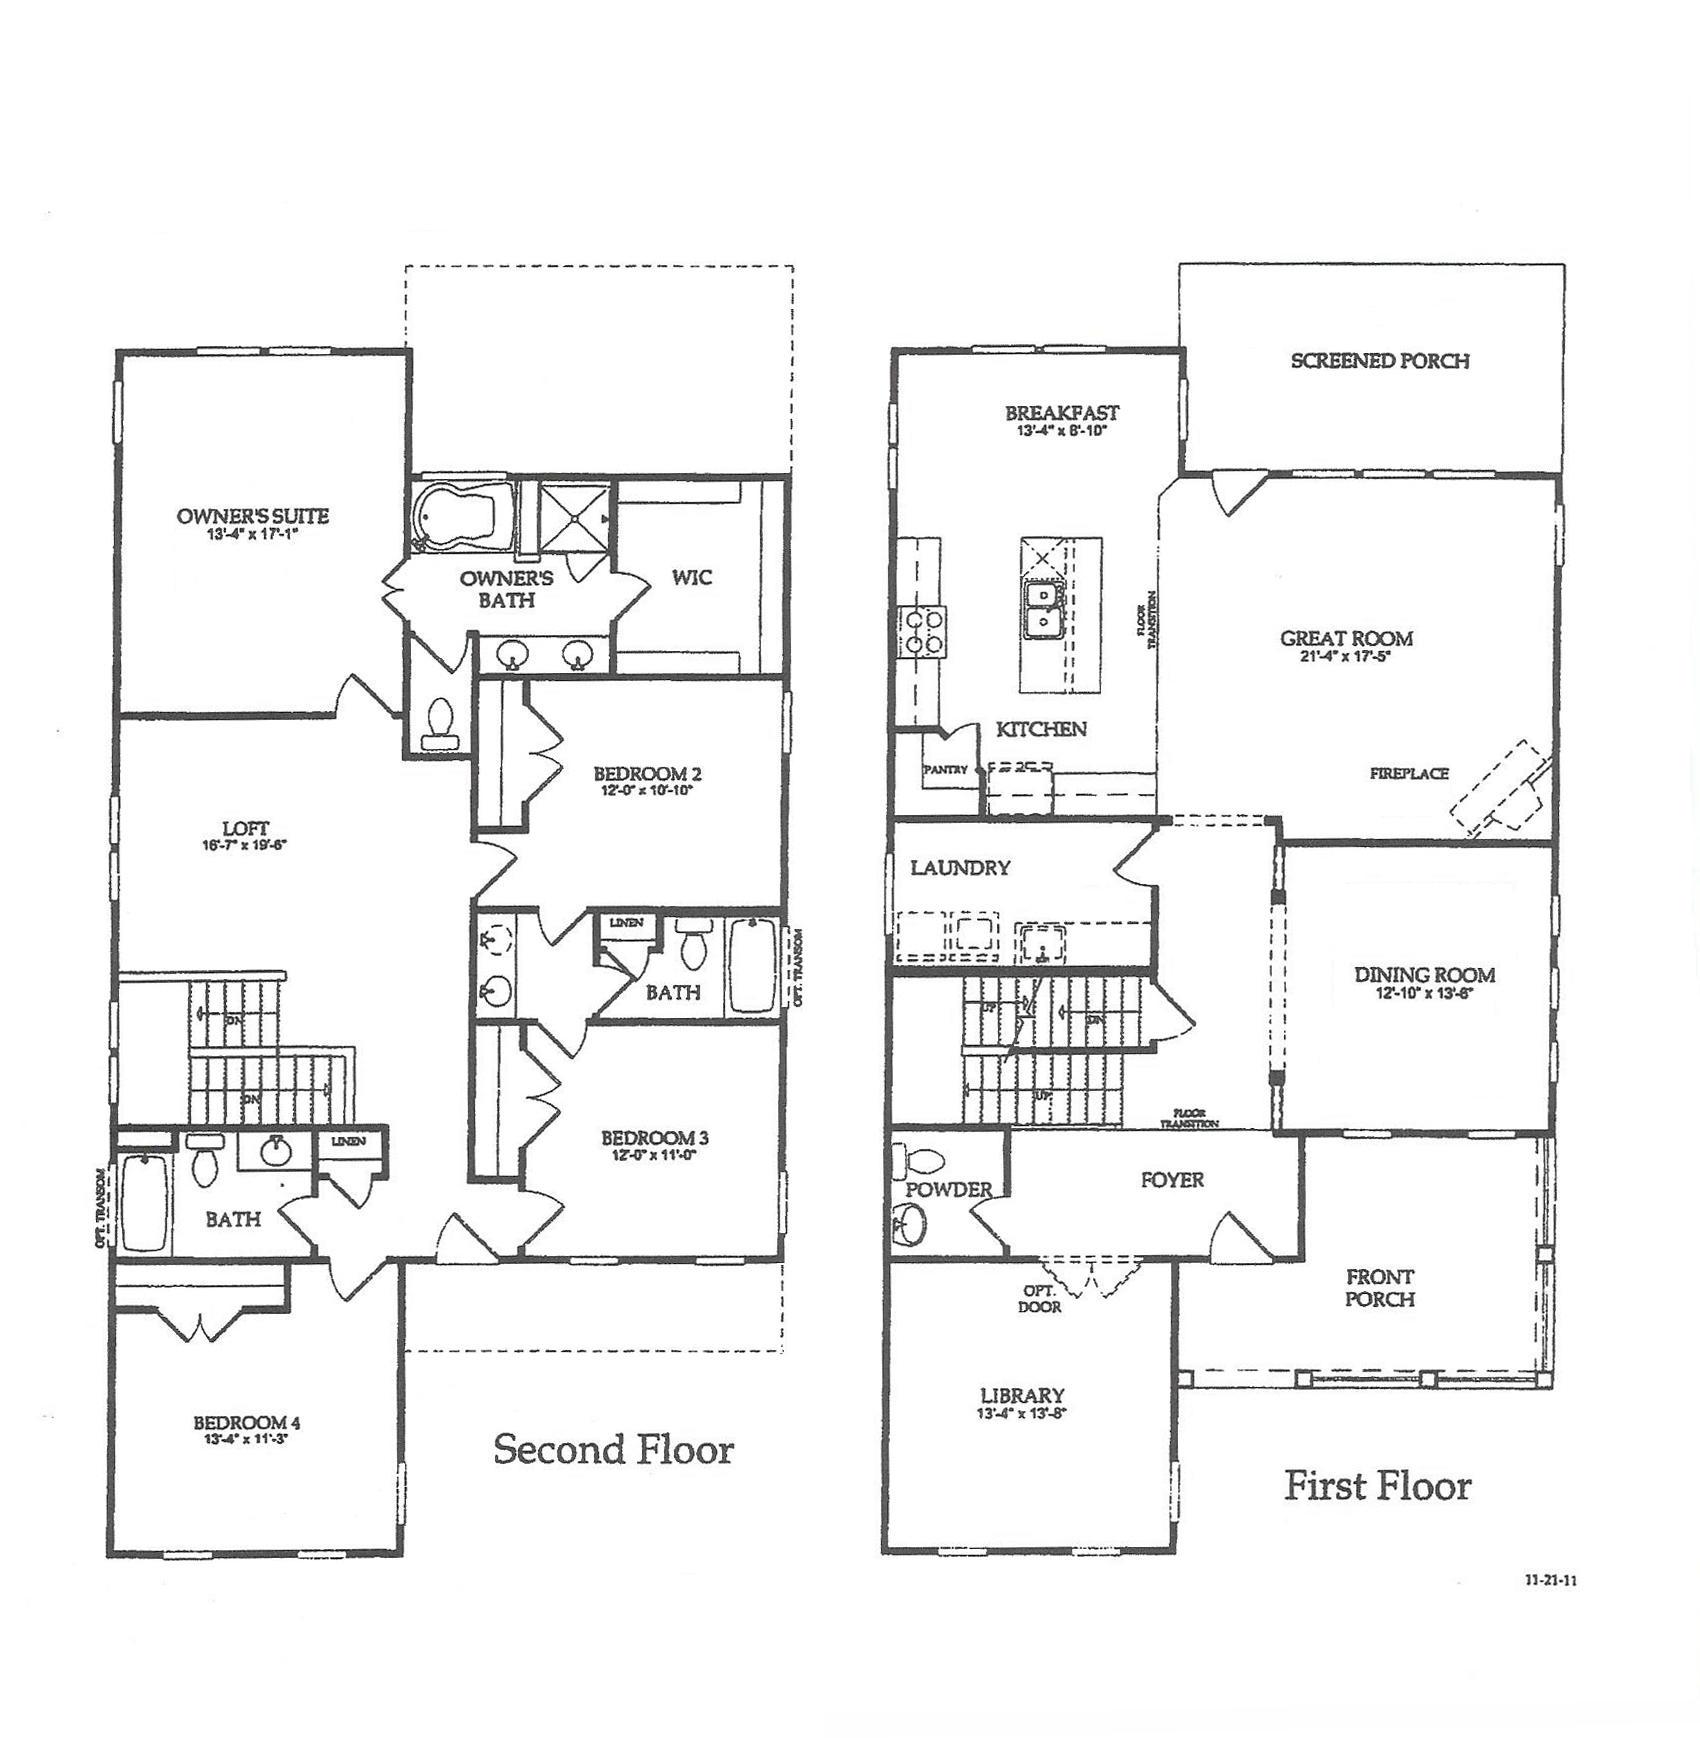 Daniel Island Homes For Sale - 1467 Wando Landing, Daniel Island, SC - 11